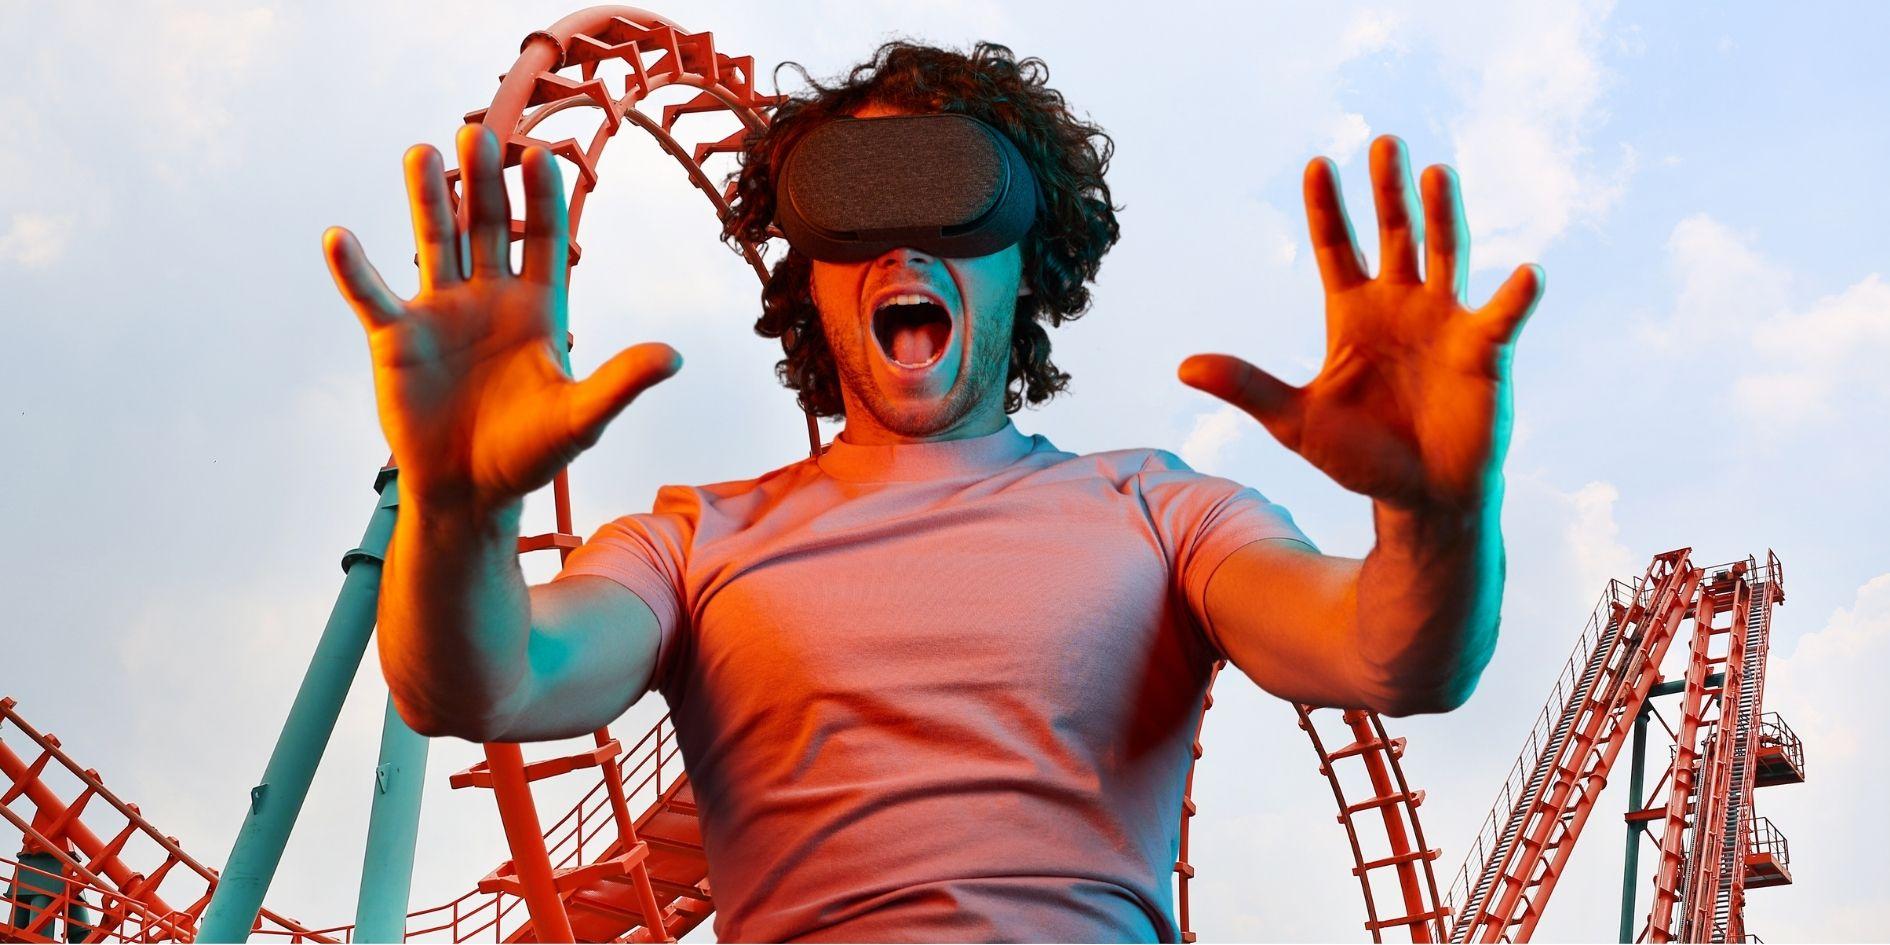 VRジェットコースターに35分間連続で乗った結果「片頭痛」患者が乗り物酔いしやすい理由が判明!